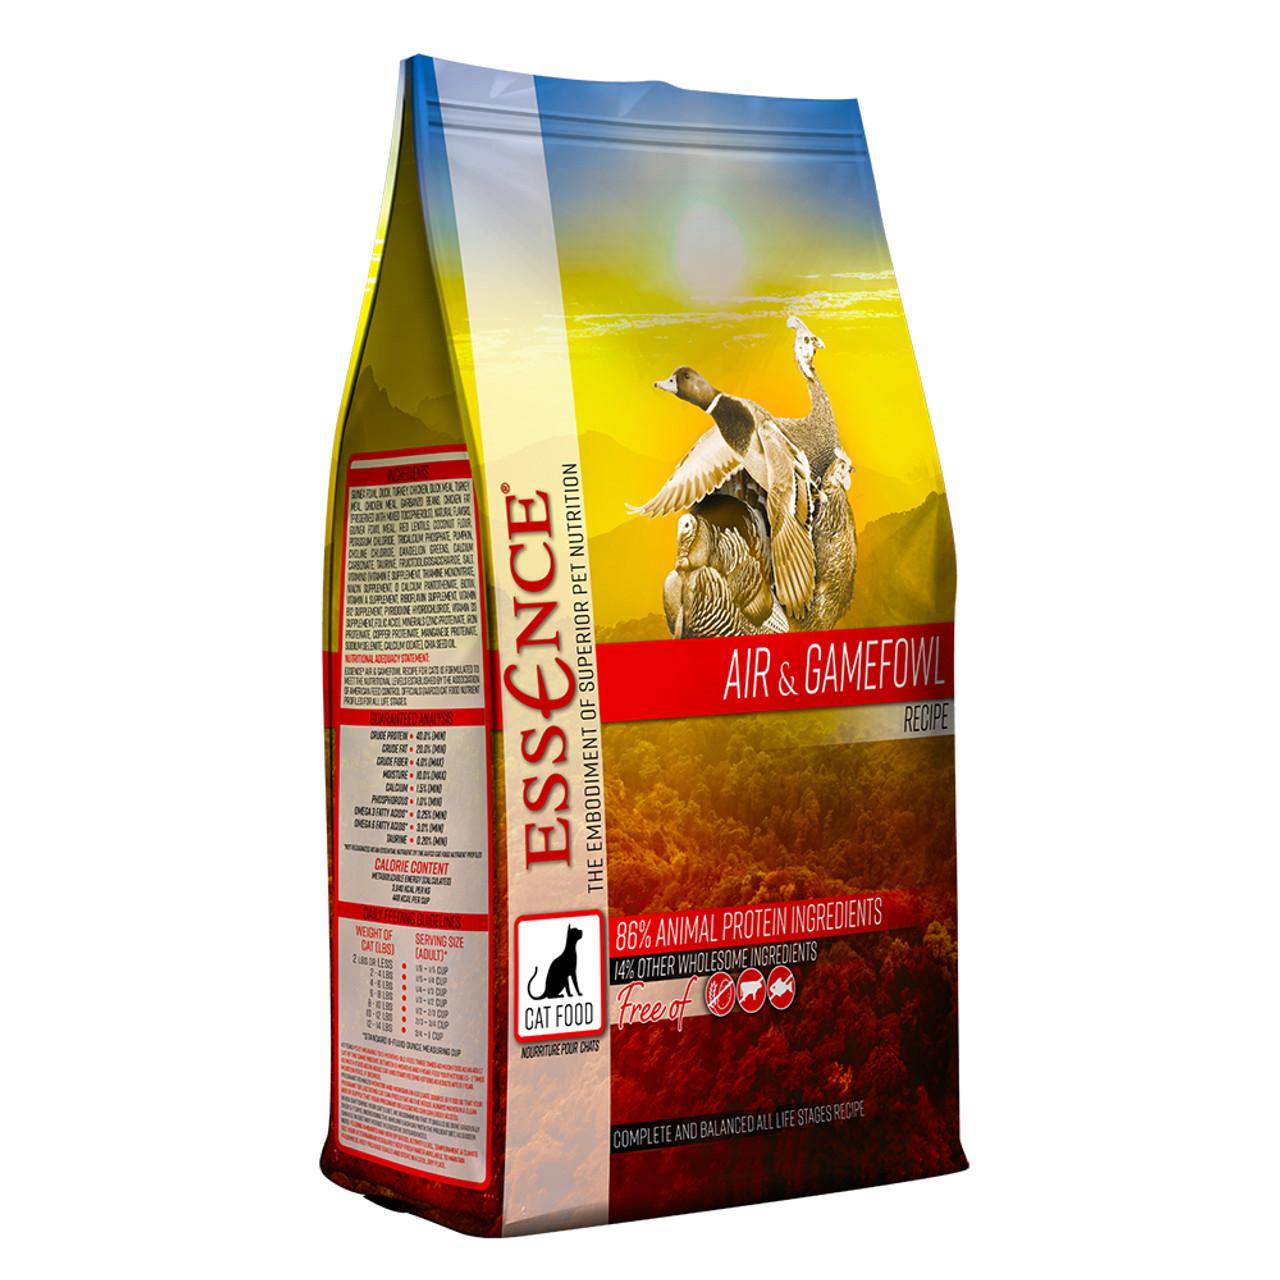 Essence Air & Gamefowl Recipe Dry Cat Food